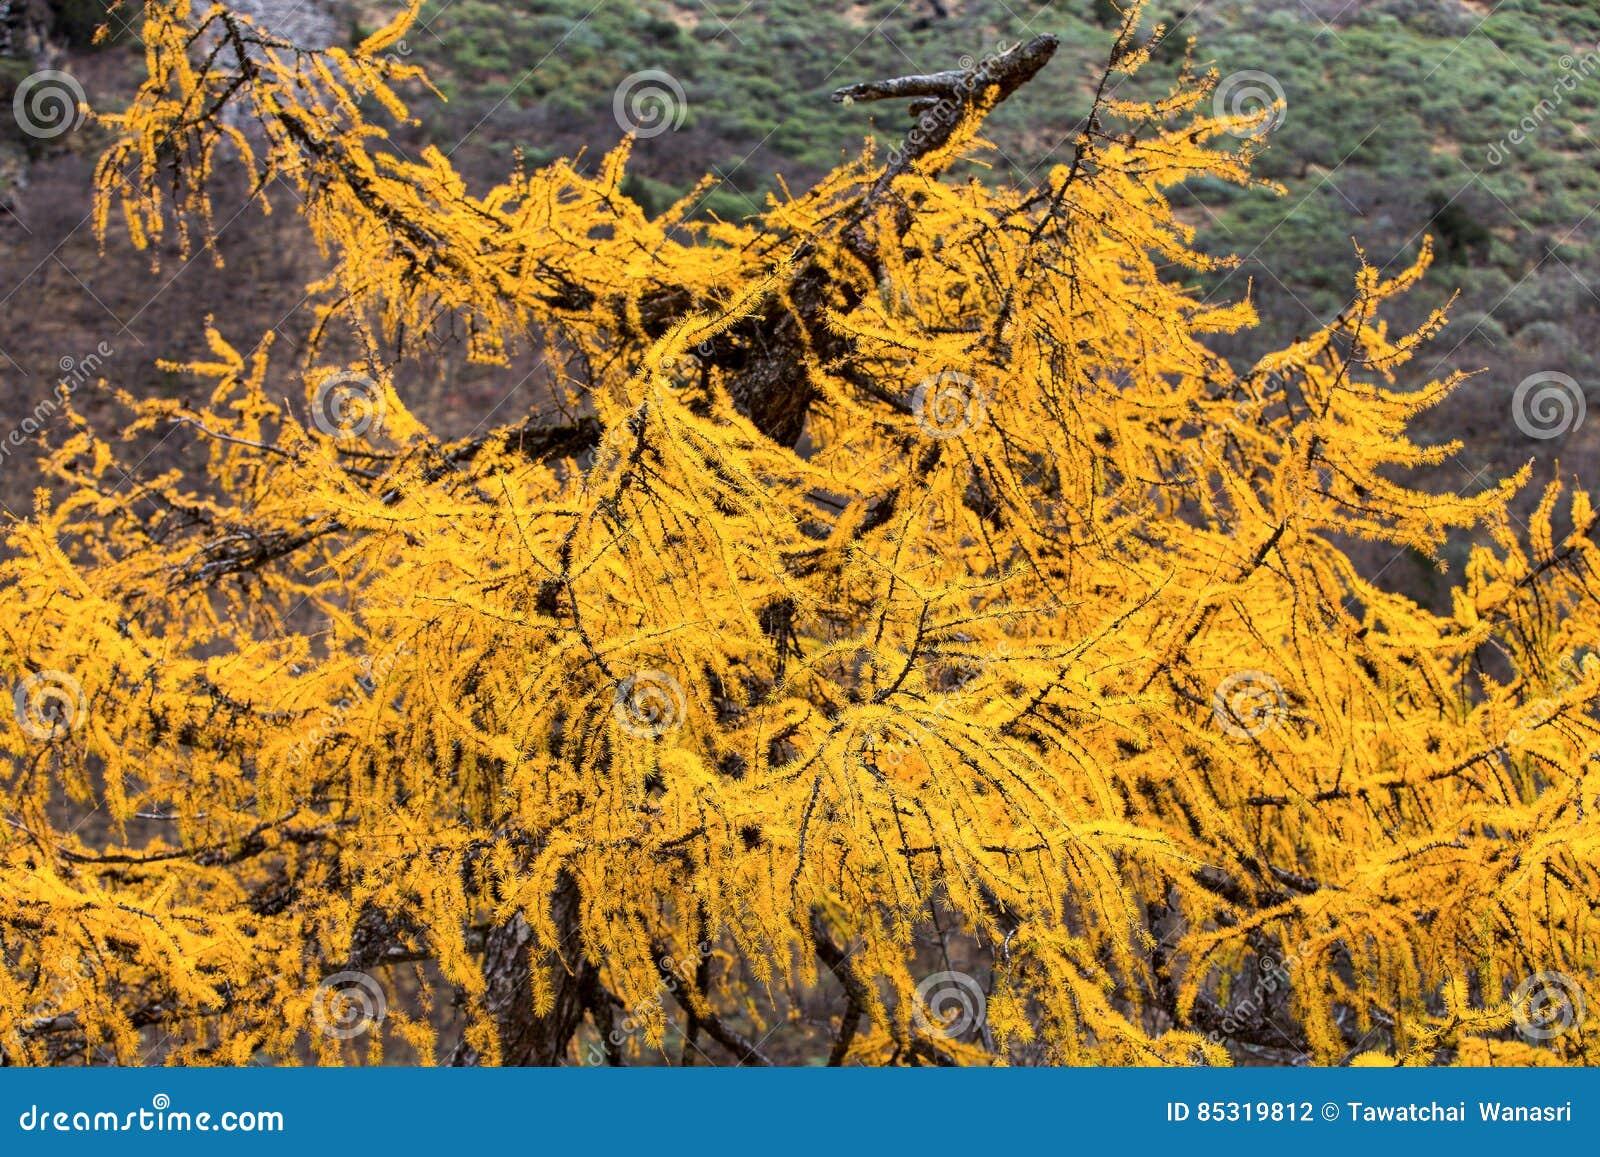 golden pine tree stock photo image of sichuan destination 85319812